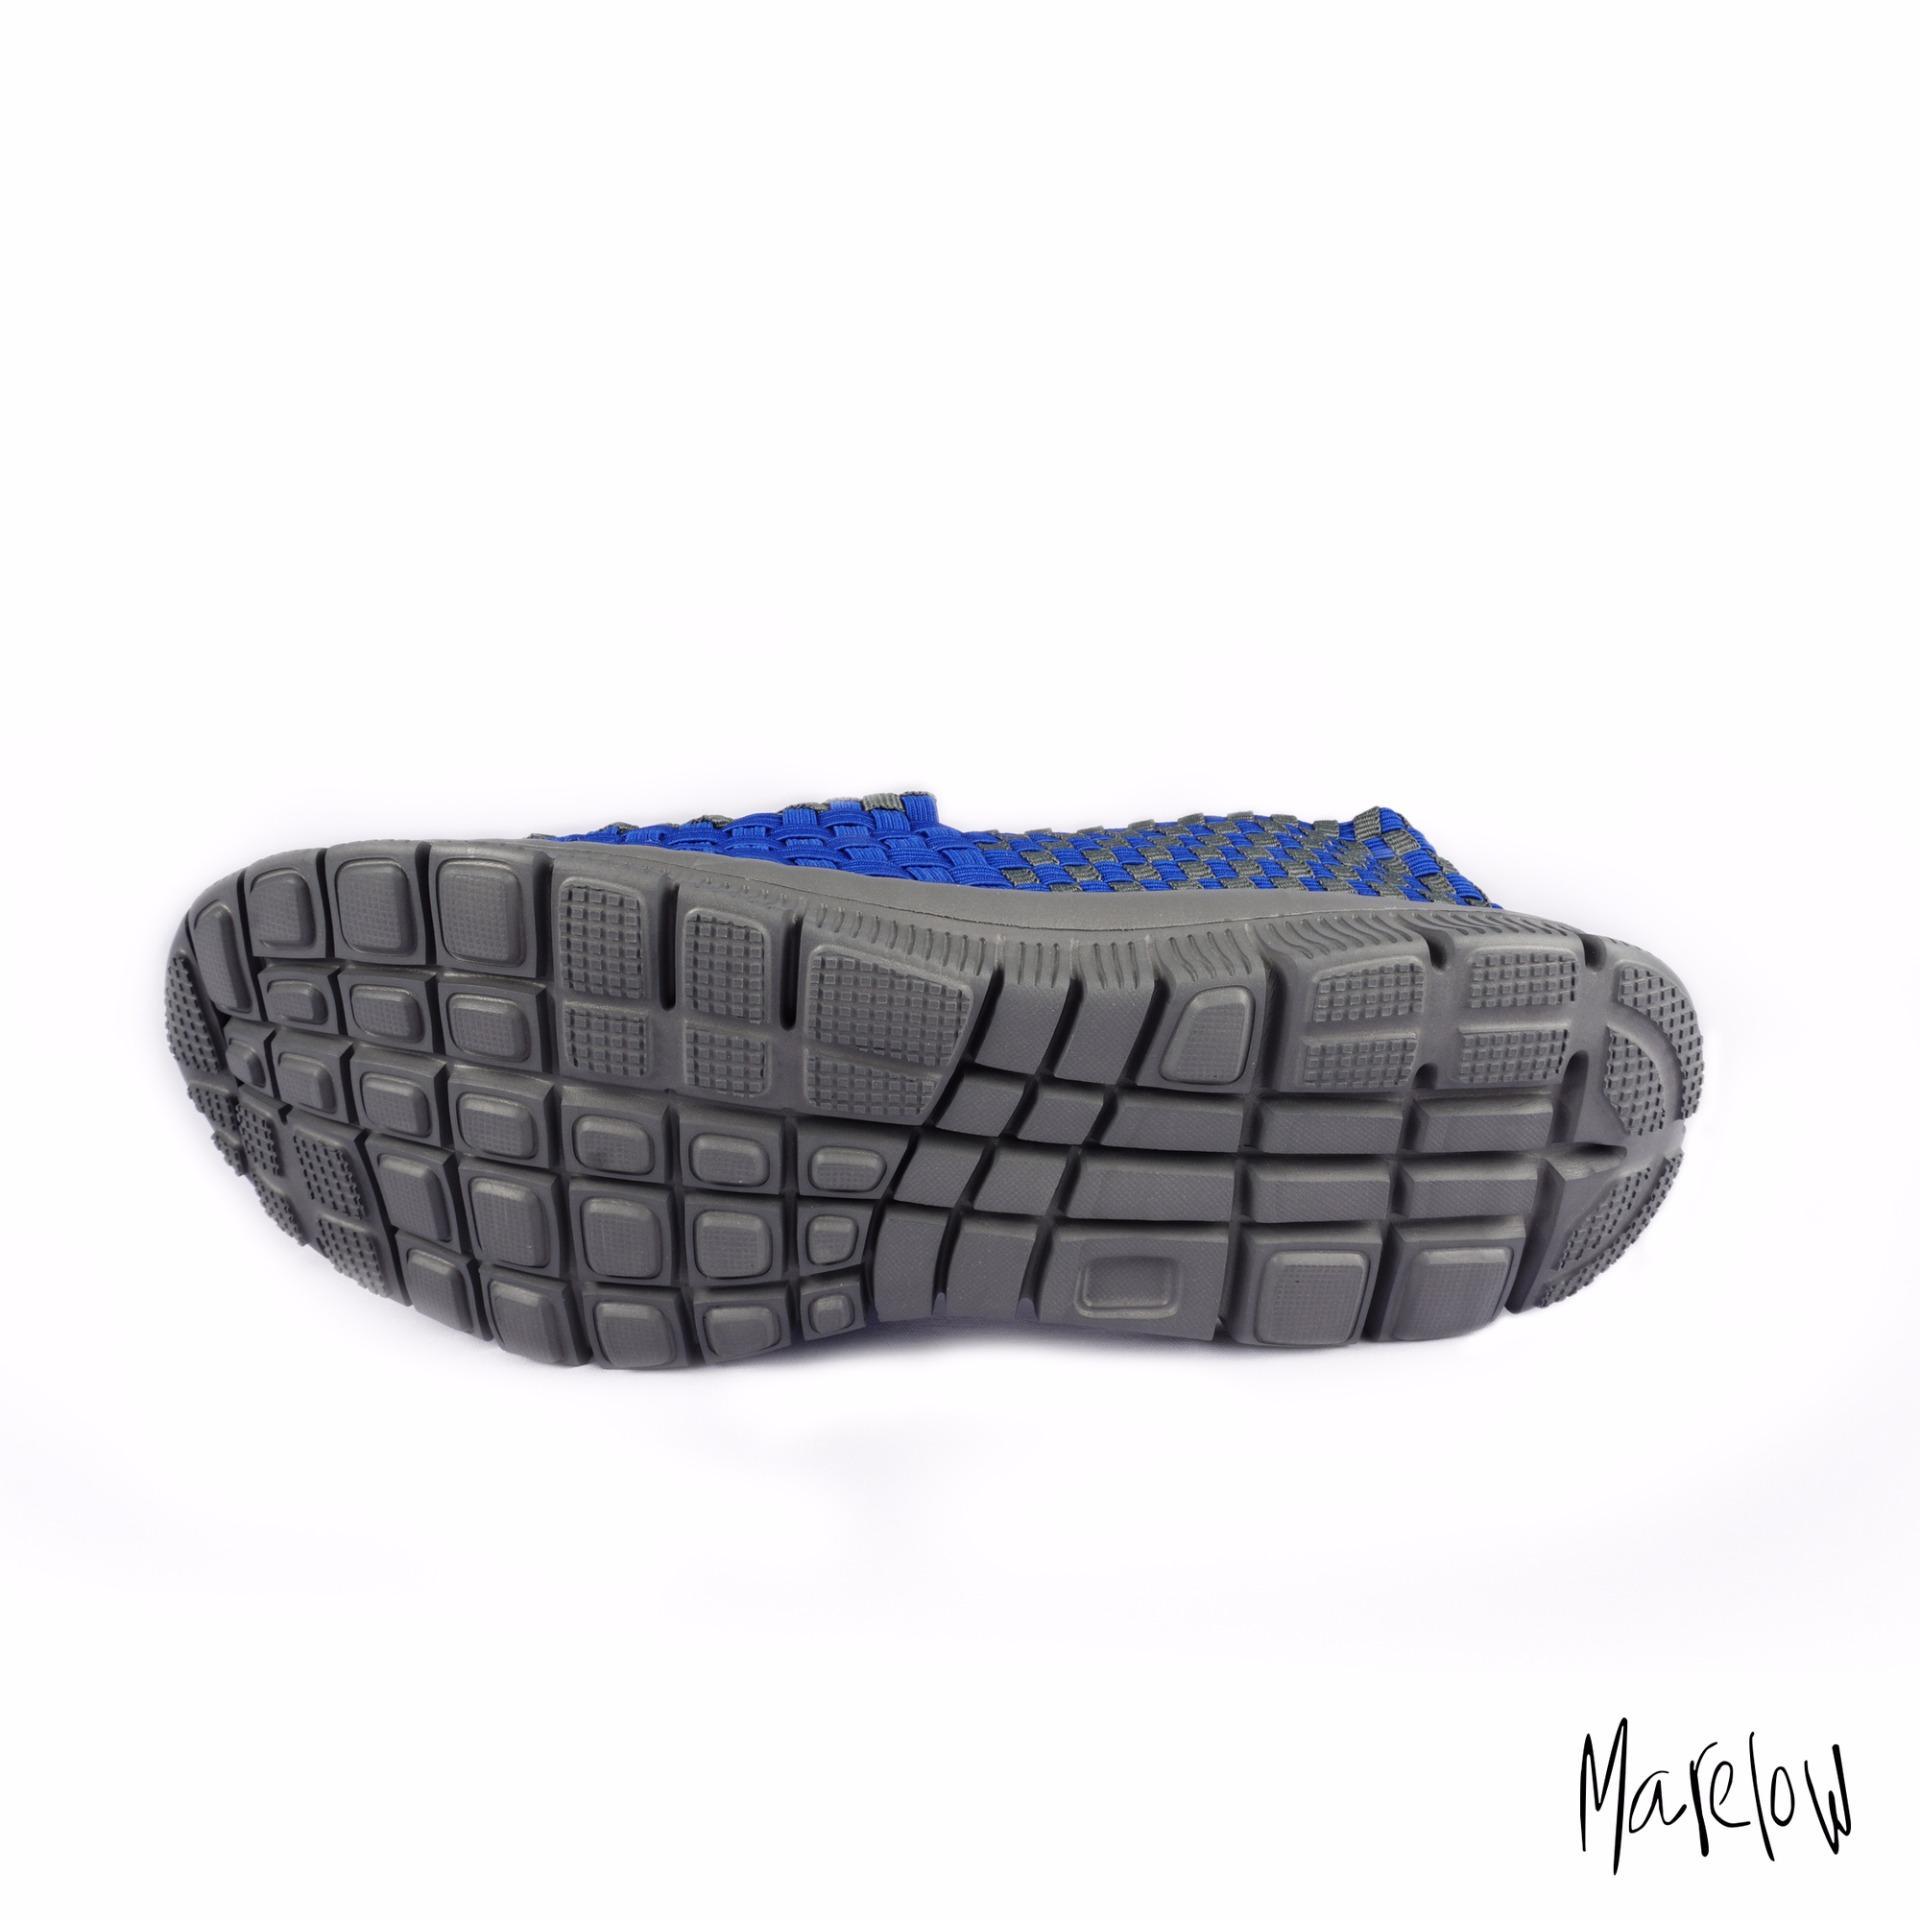 Sepatu Casual Denim Cowok Import - Info Daftar Harga Terbaru Indonesia 12632d9c3e